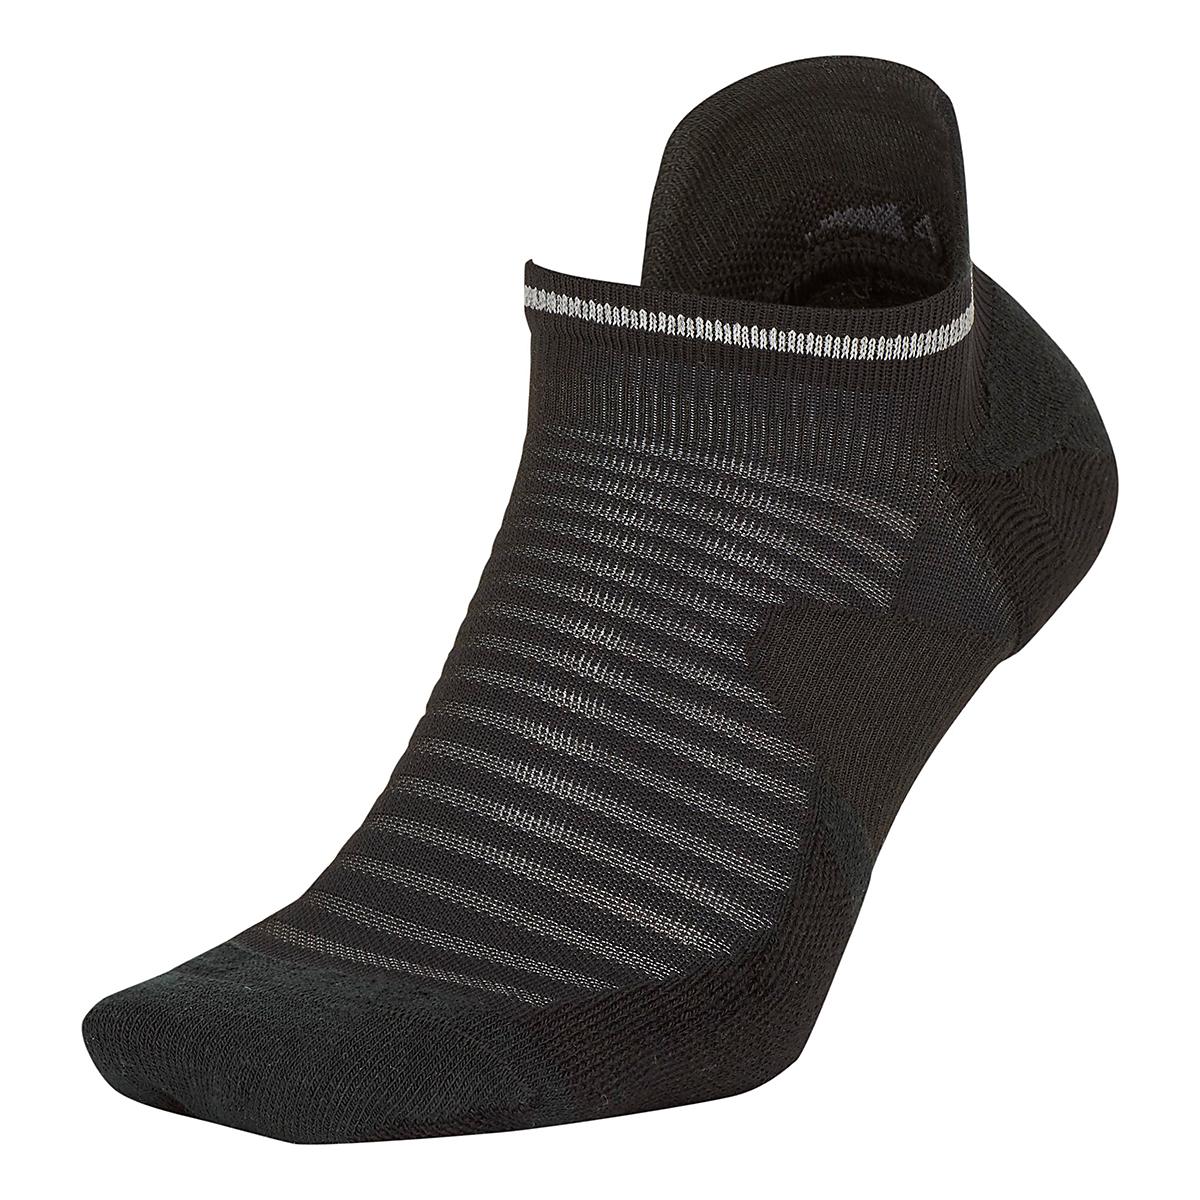 Nike Spark Cushion No Show Sock - Color: Black - Size: 4/5.5, Black, large, image 1